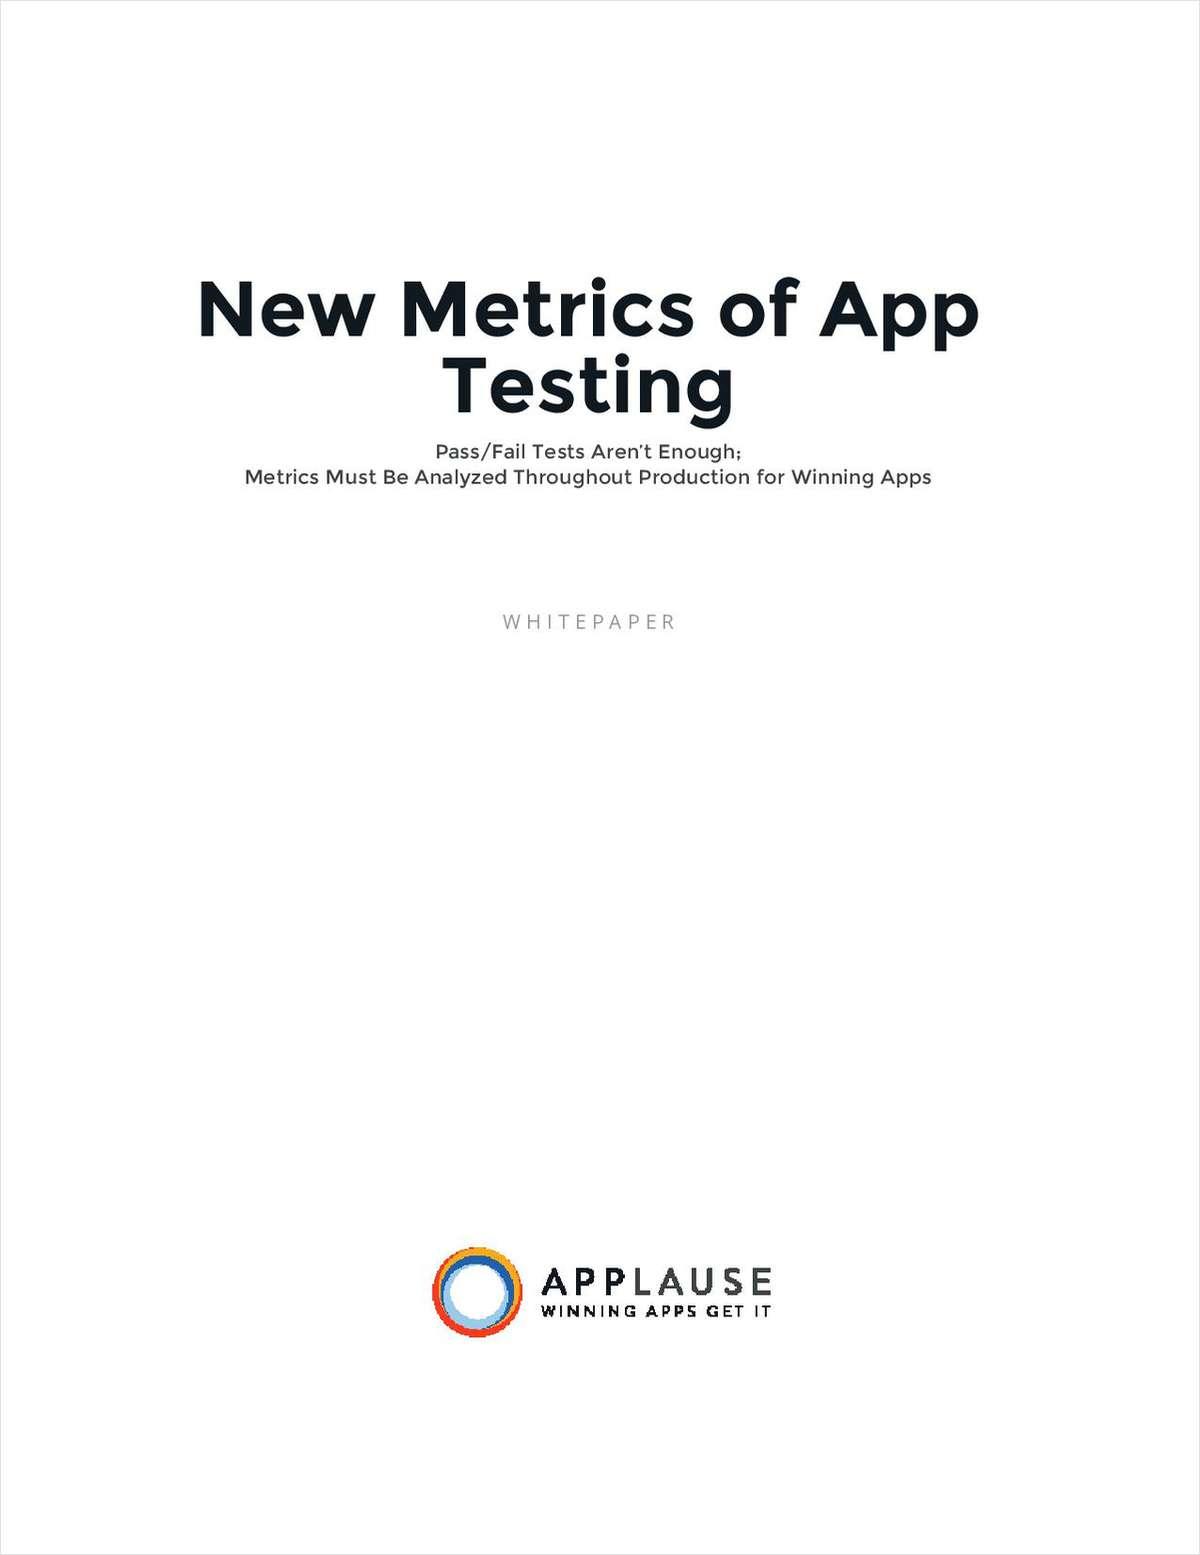 The New Metrics of App Testing